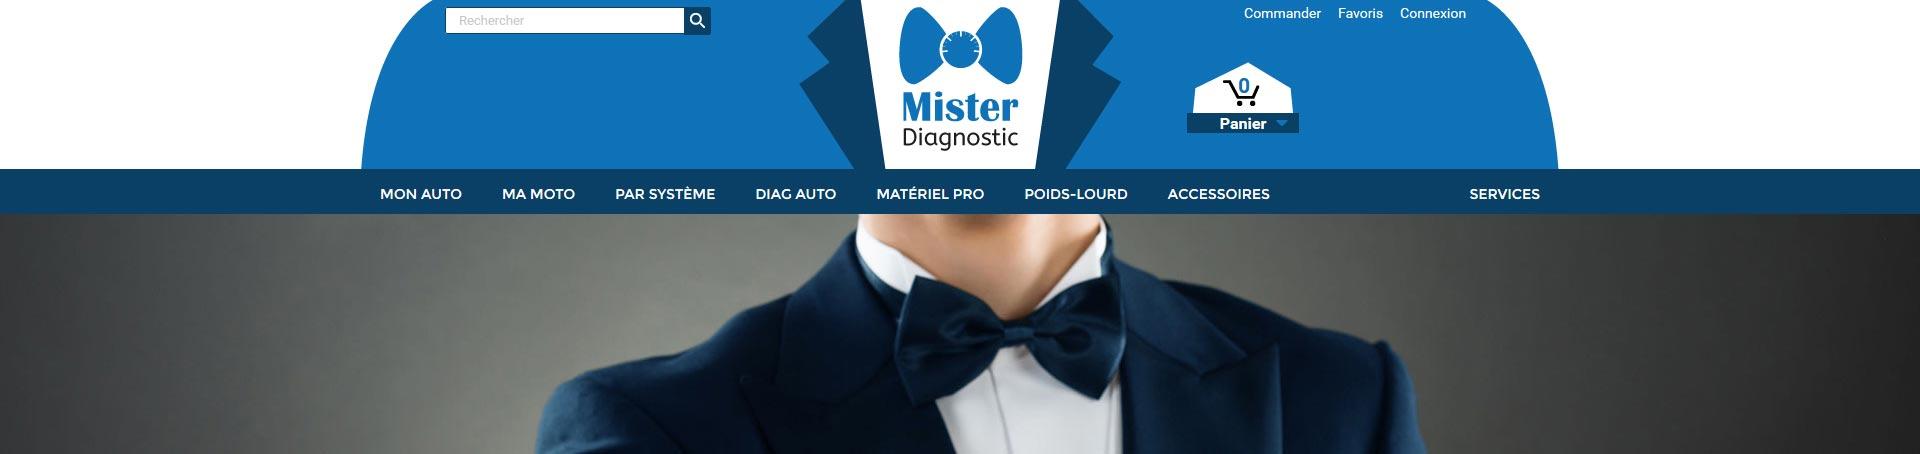 mister diagnostic